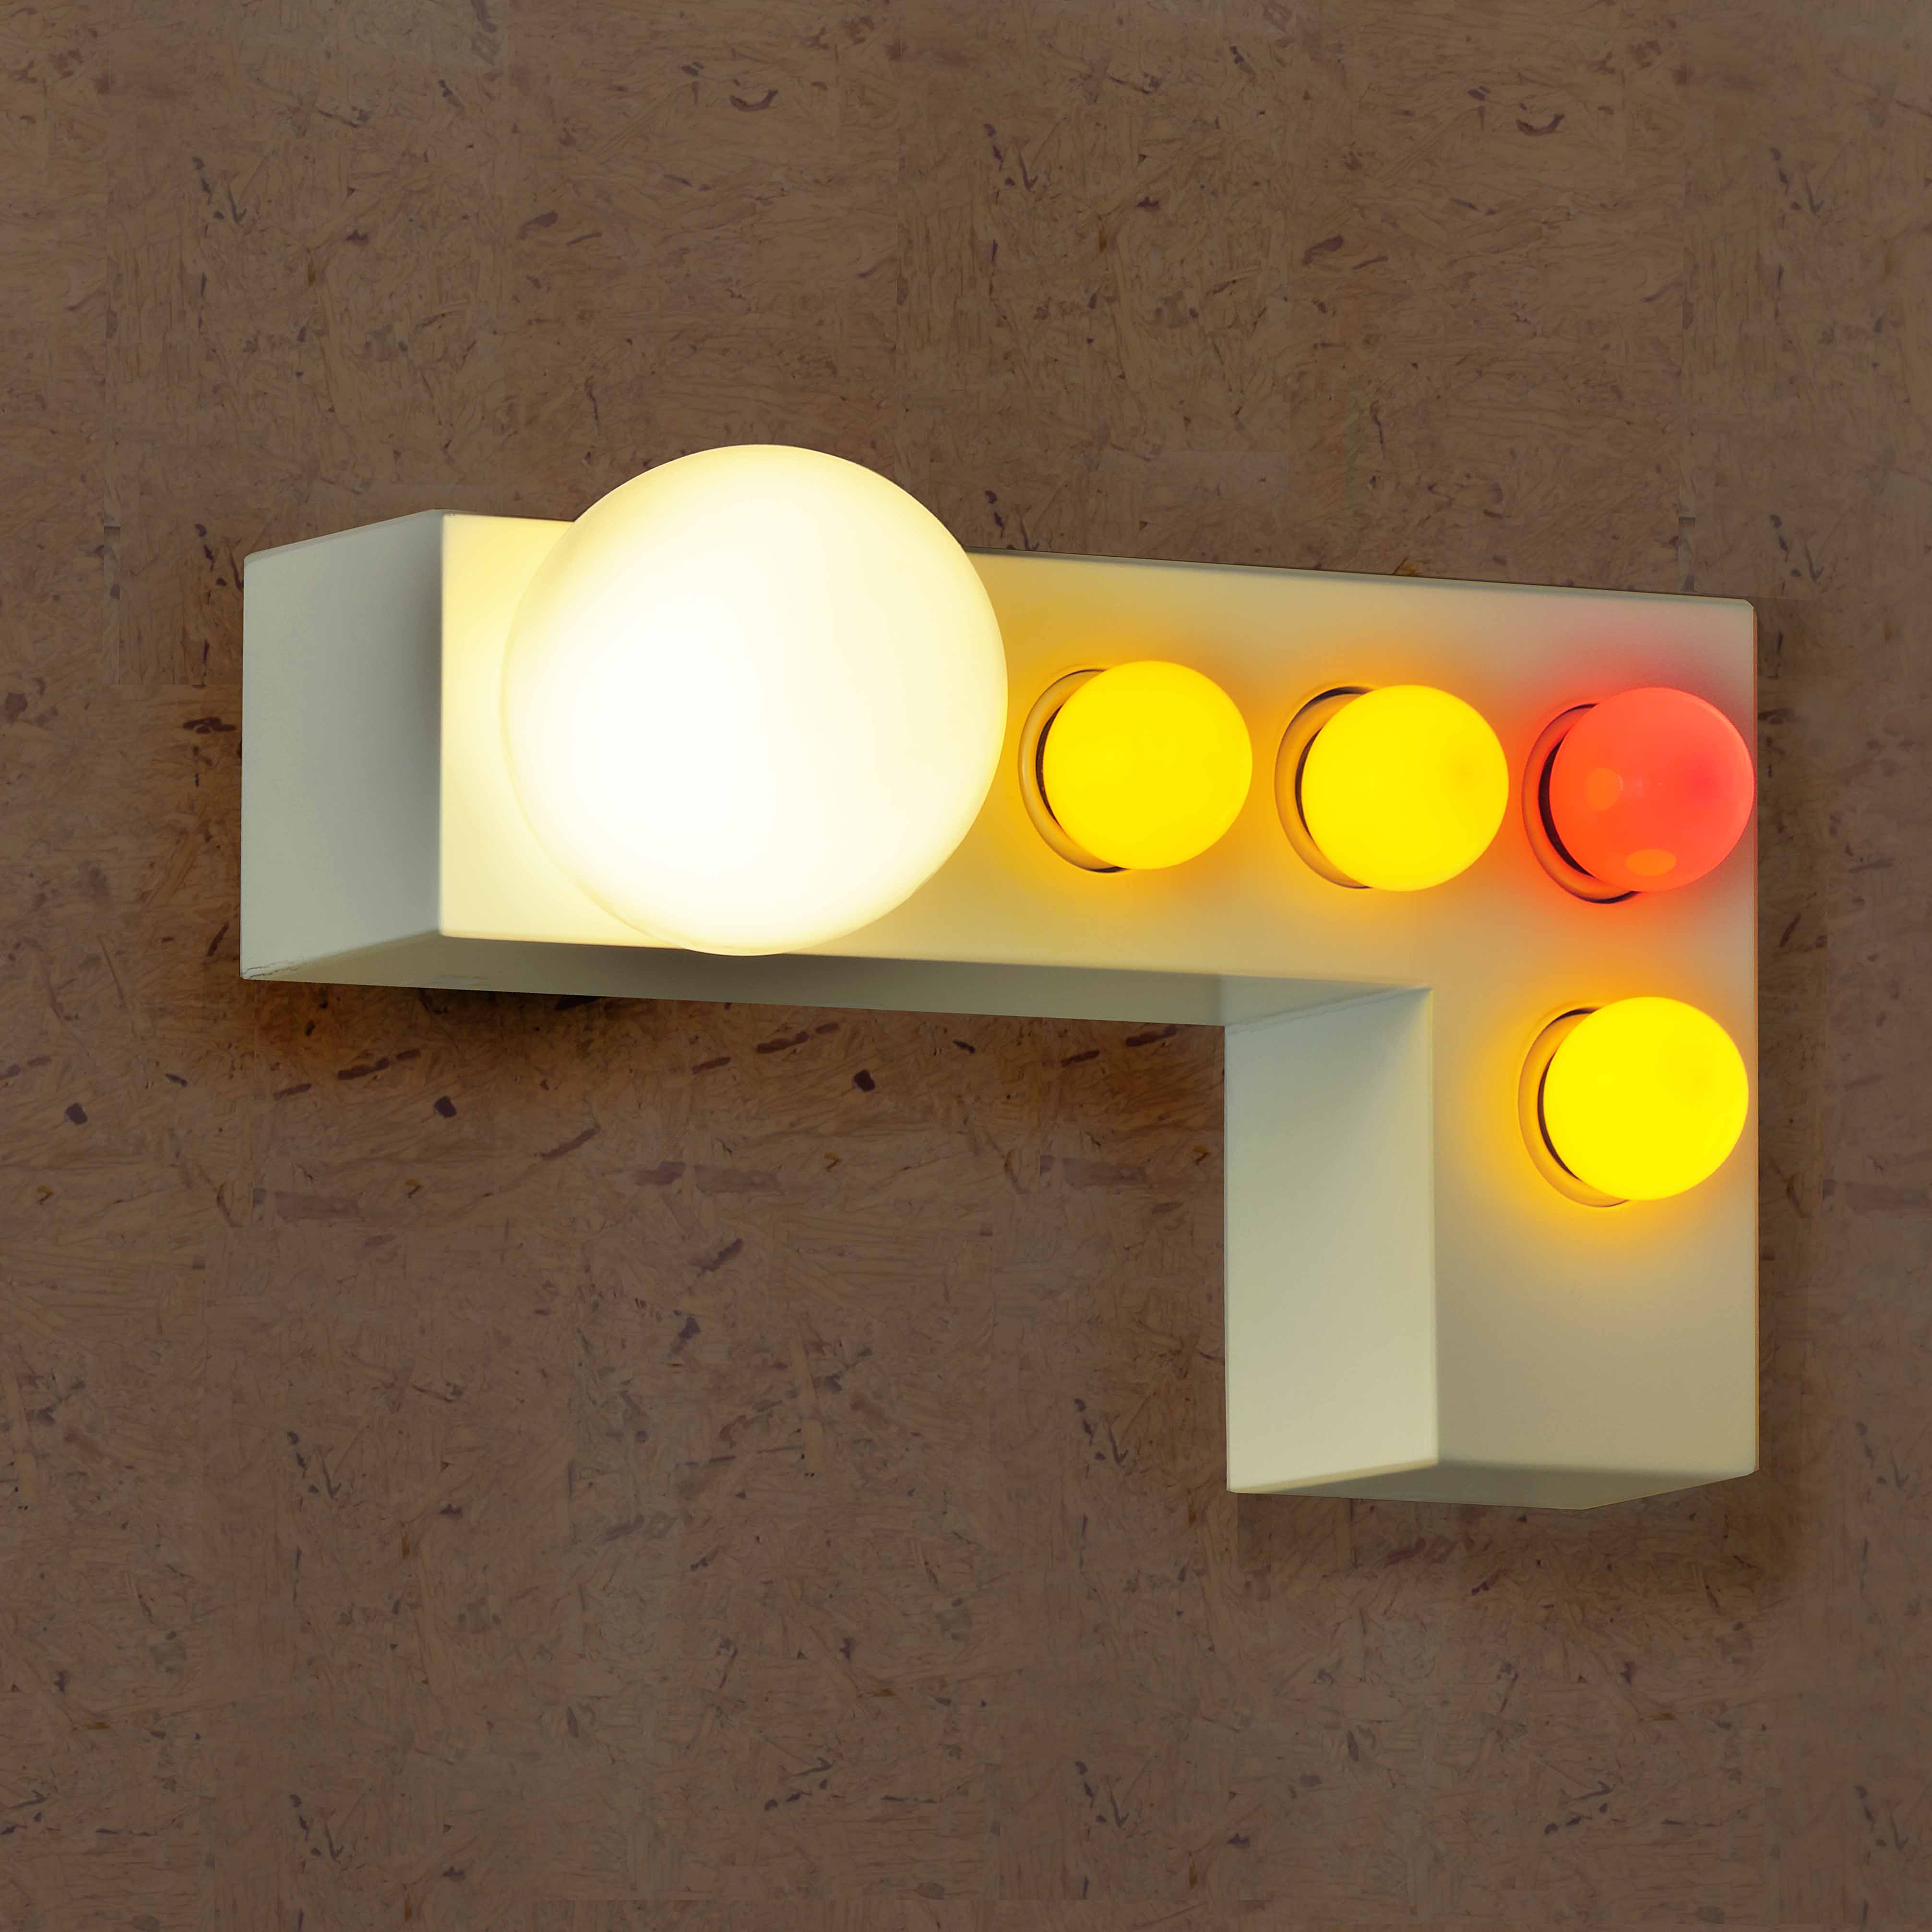 Lighting lighting art gallery twenty two ettore sottsass mozeypictures Choice Image